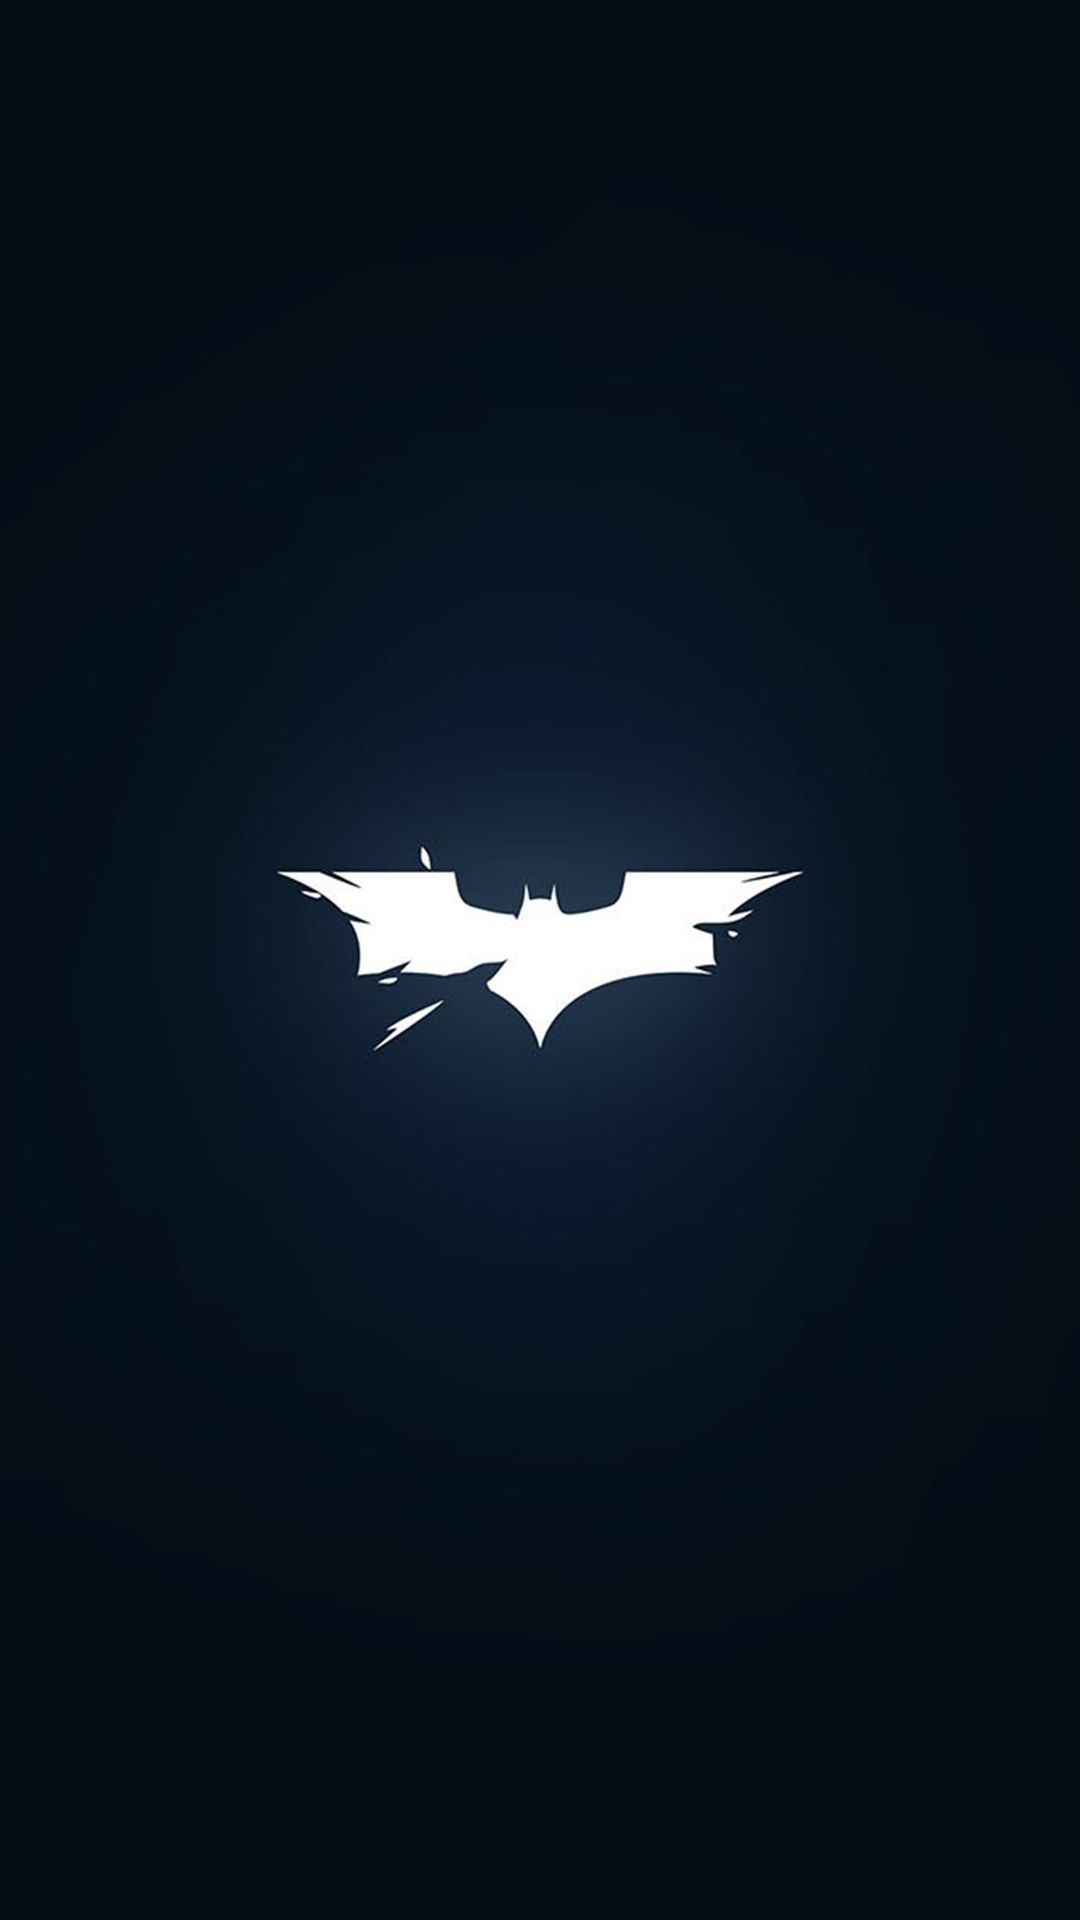 Batman Iphone Plus Wallpapers